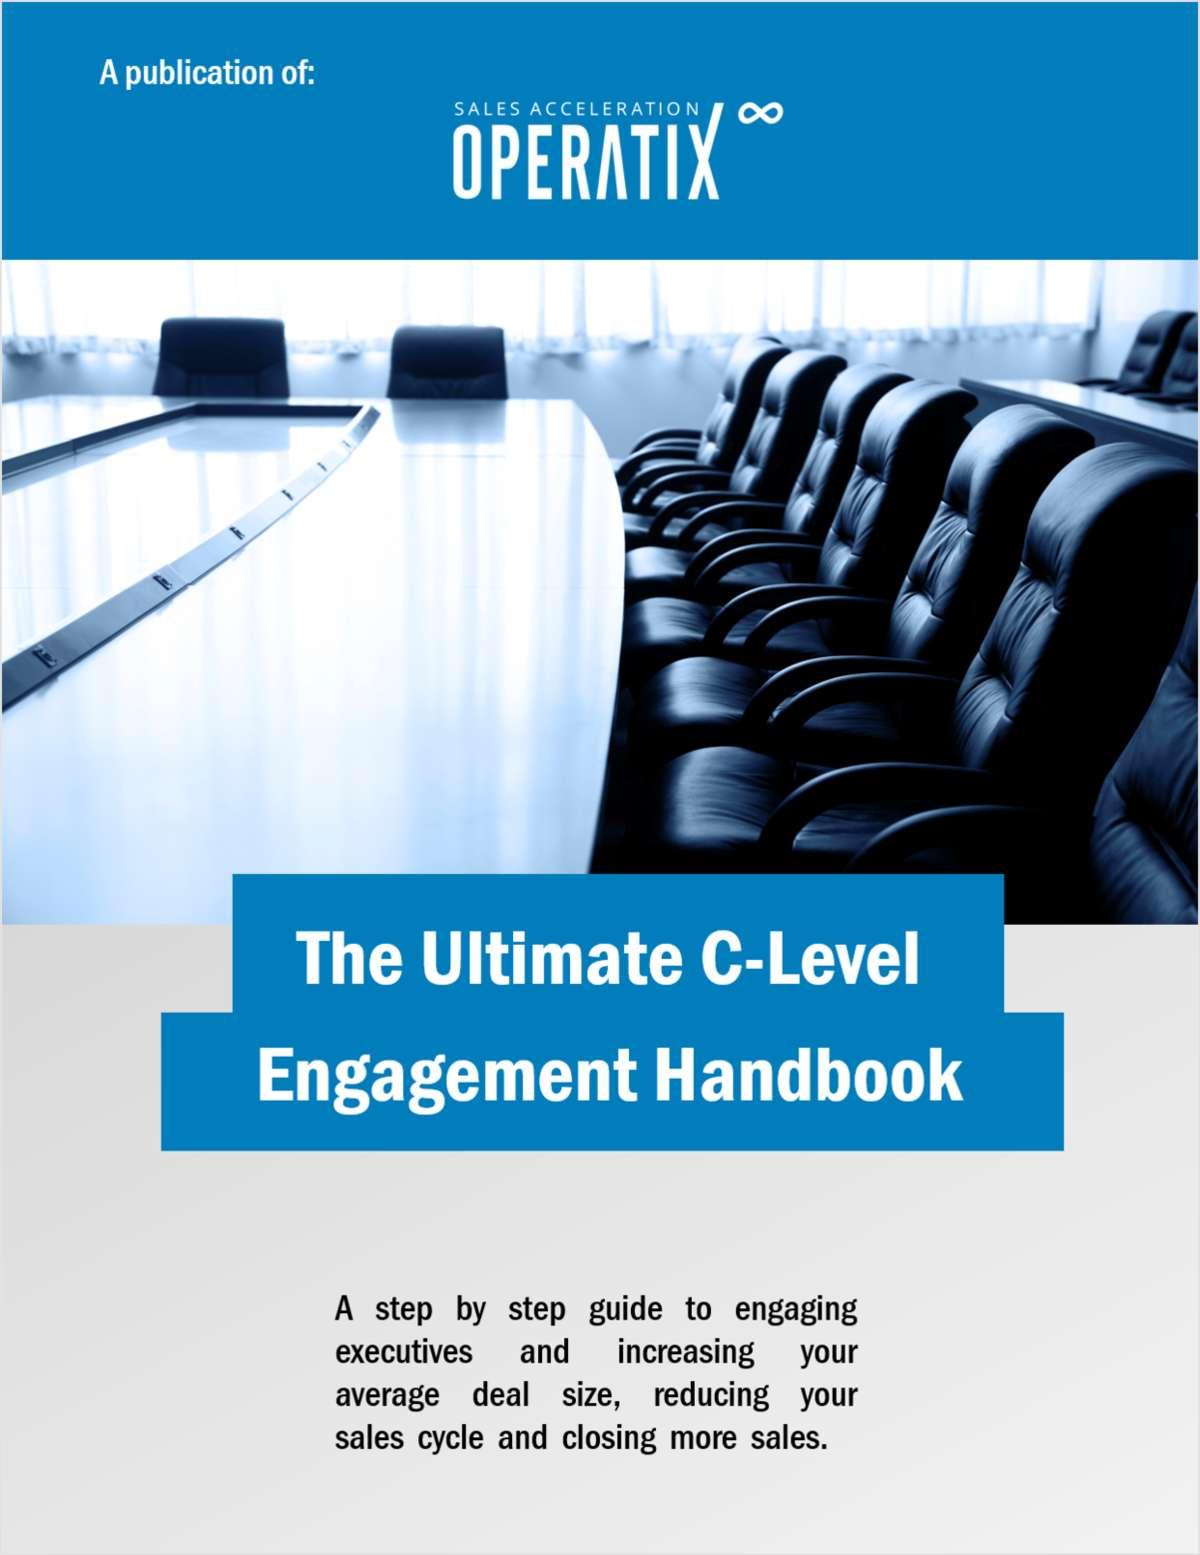 The Ultimate C-level Engagement Handbook